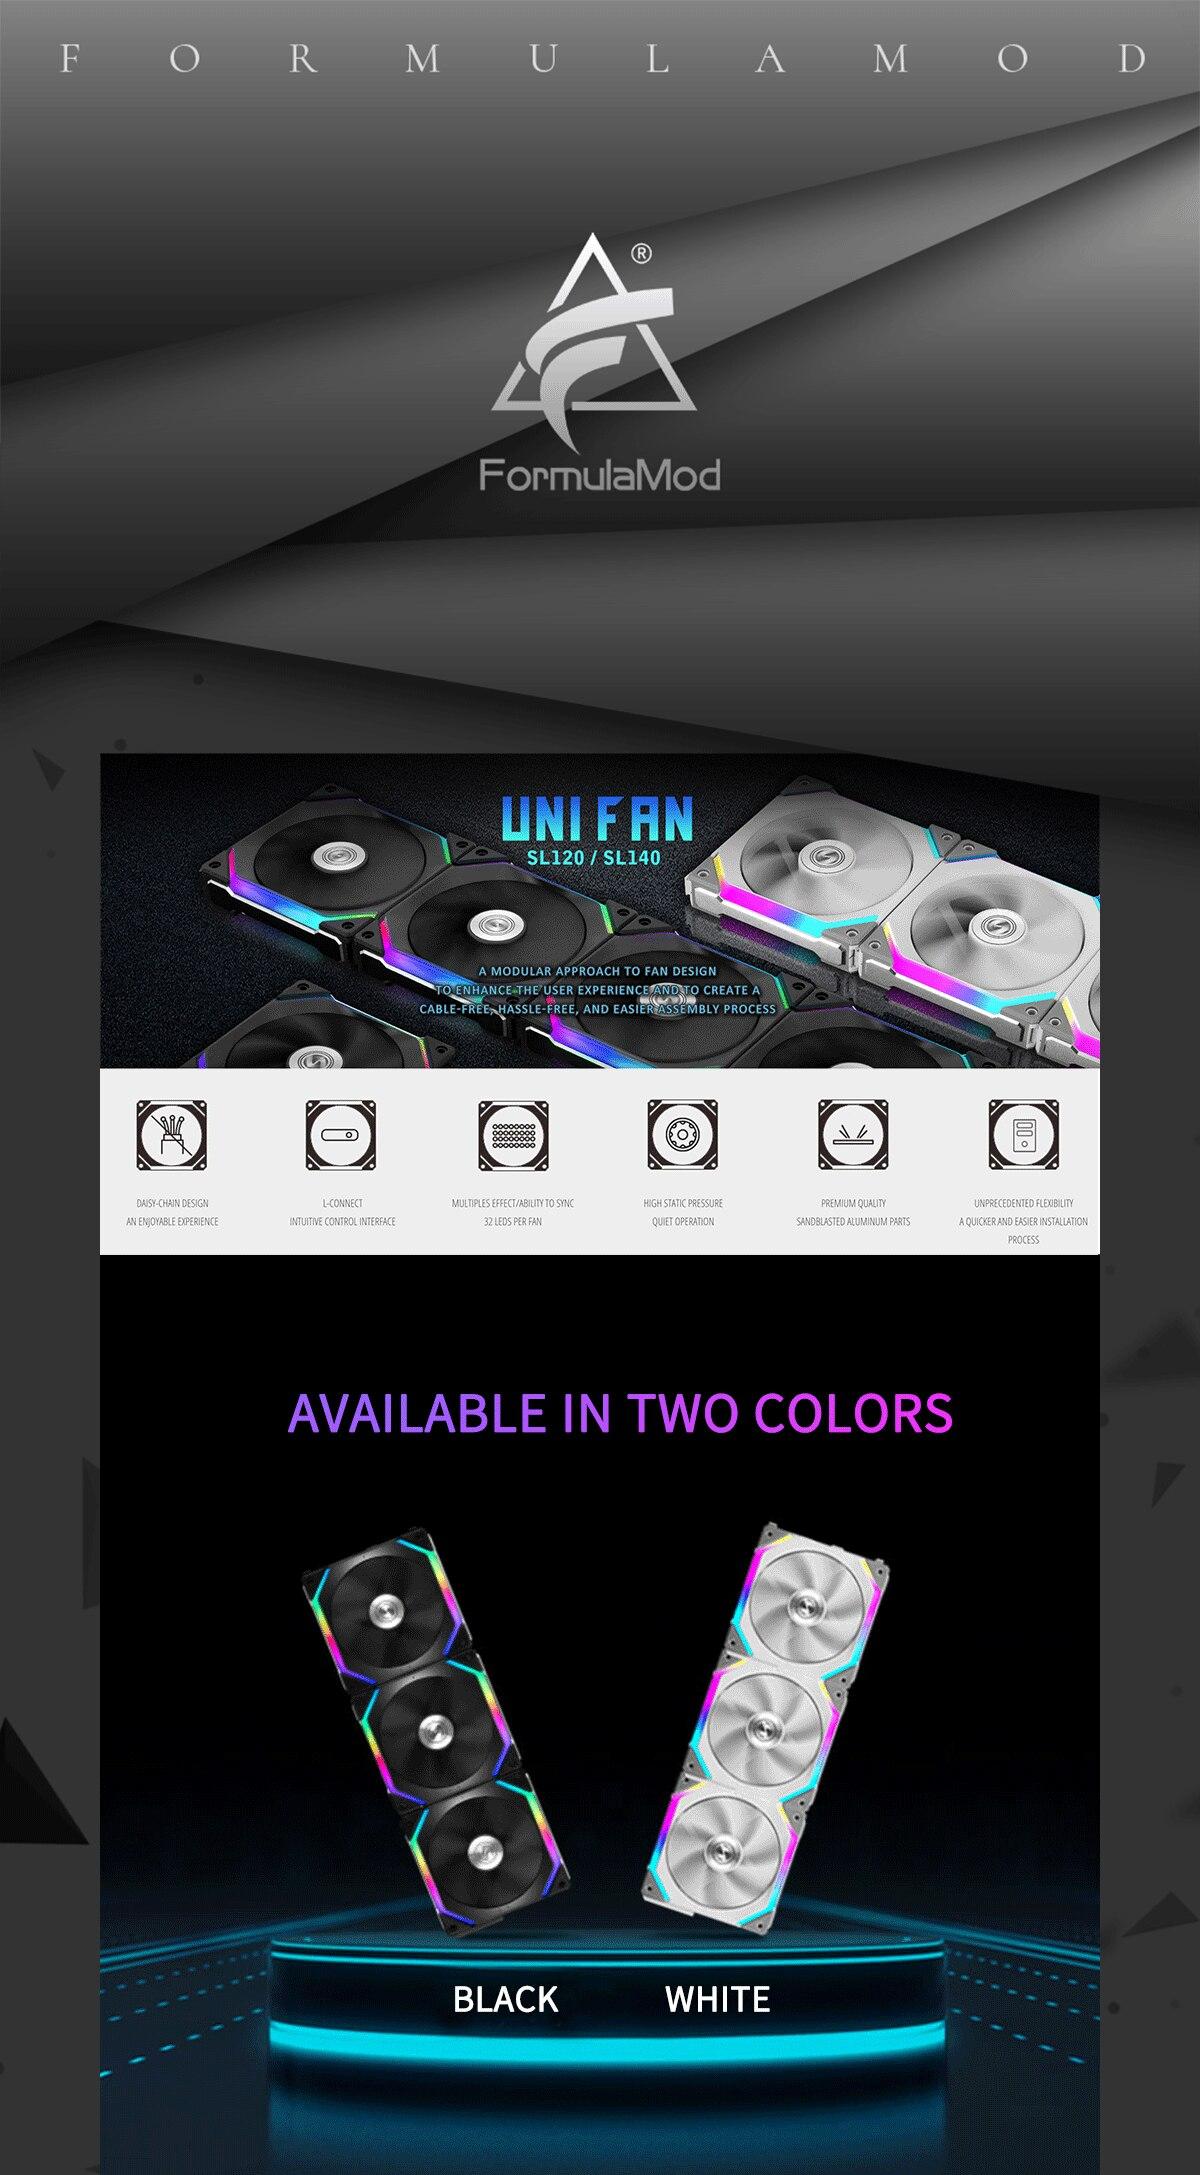 Lian Li UNI FAN SL120 SL140 With Controller High Stati Pressure 120/140mm FAN Software Smart PWM Control SYNC Black / White Computer Fan